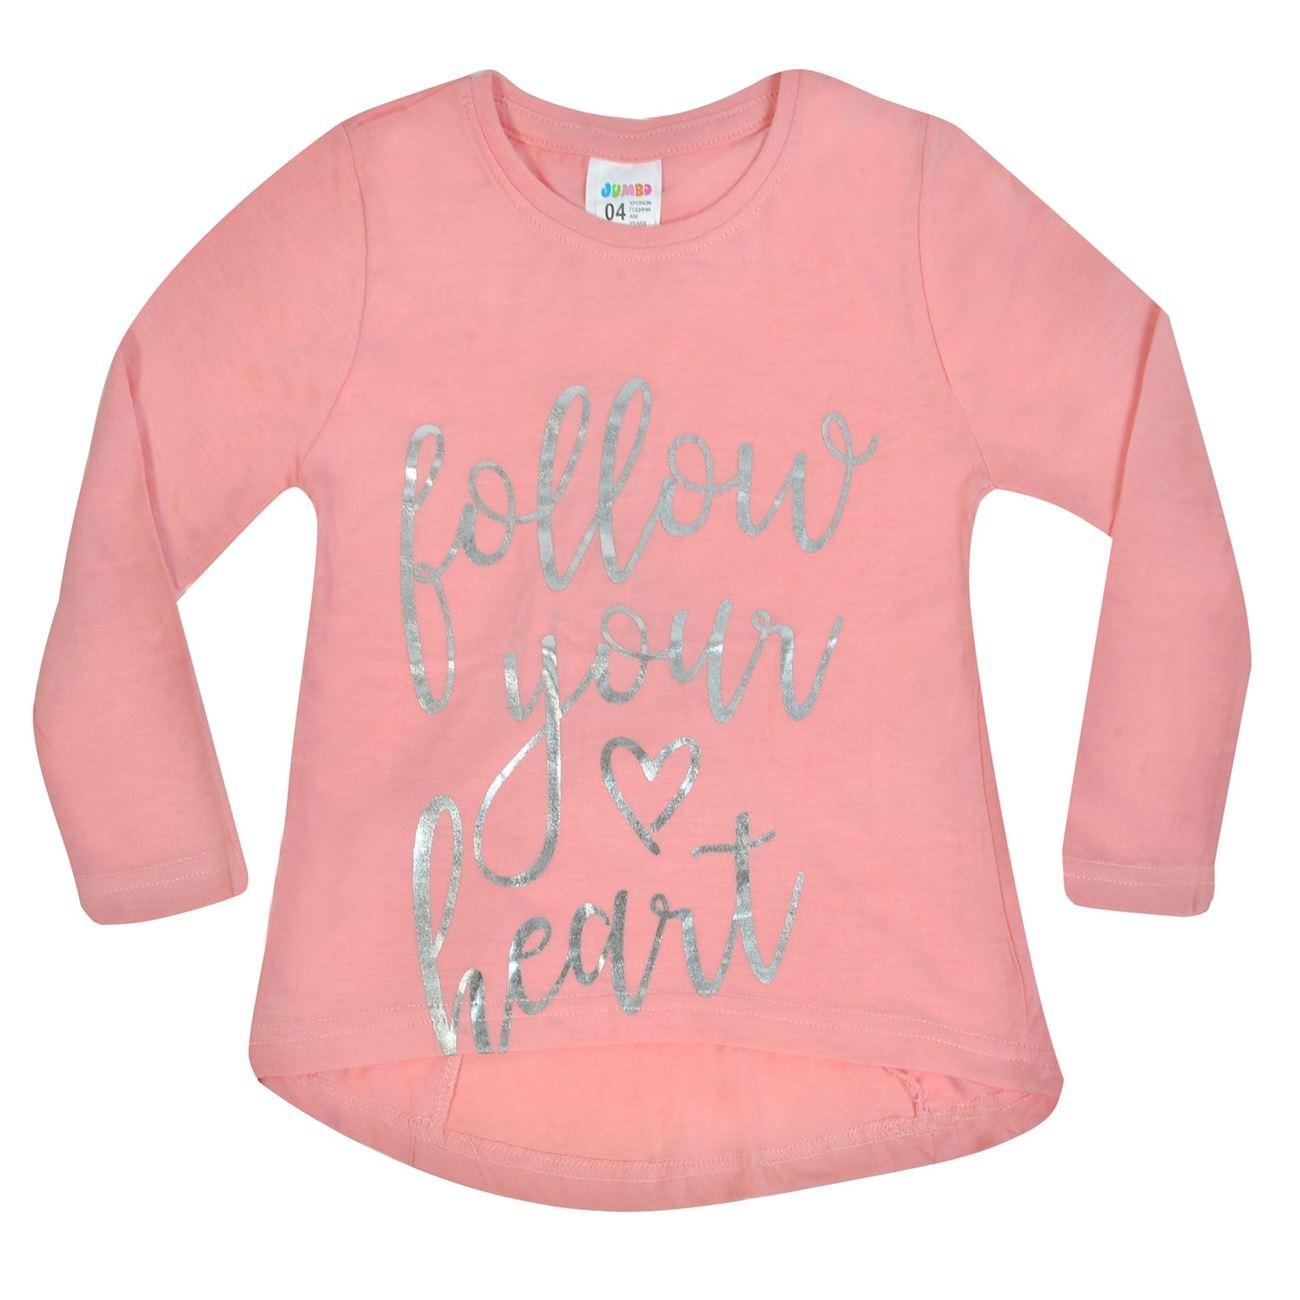 23ae379f750e Μπλούζα Μακρυμάνικη Παιδική Κοραλλί Flouo Ασημί Τύπωμα   Μπλουζάκια ...